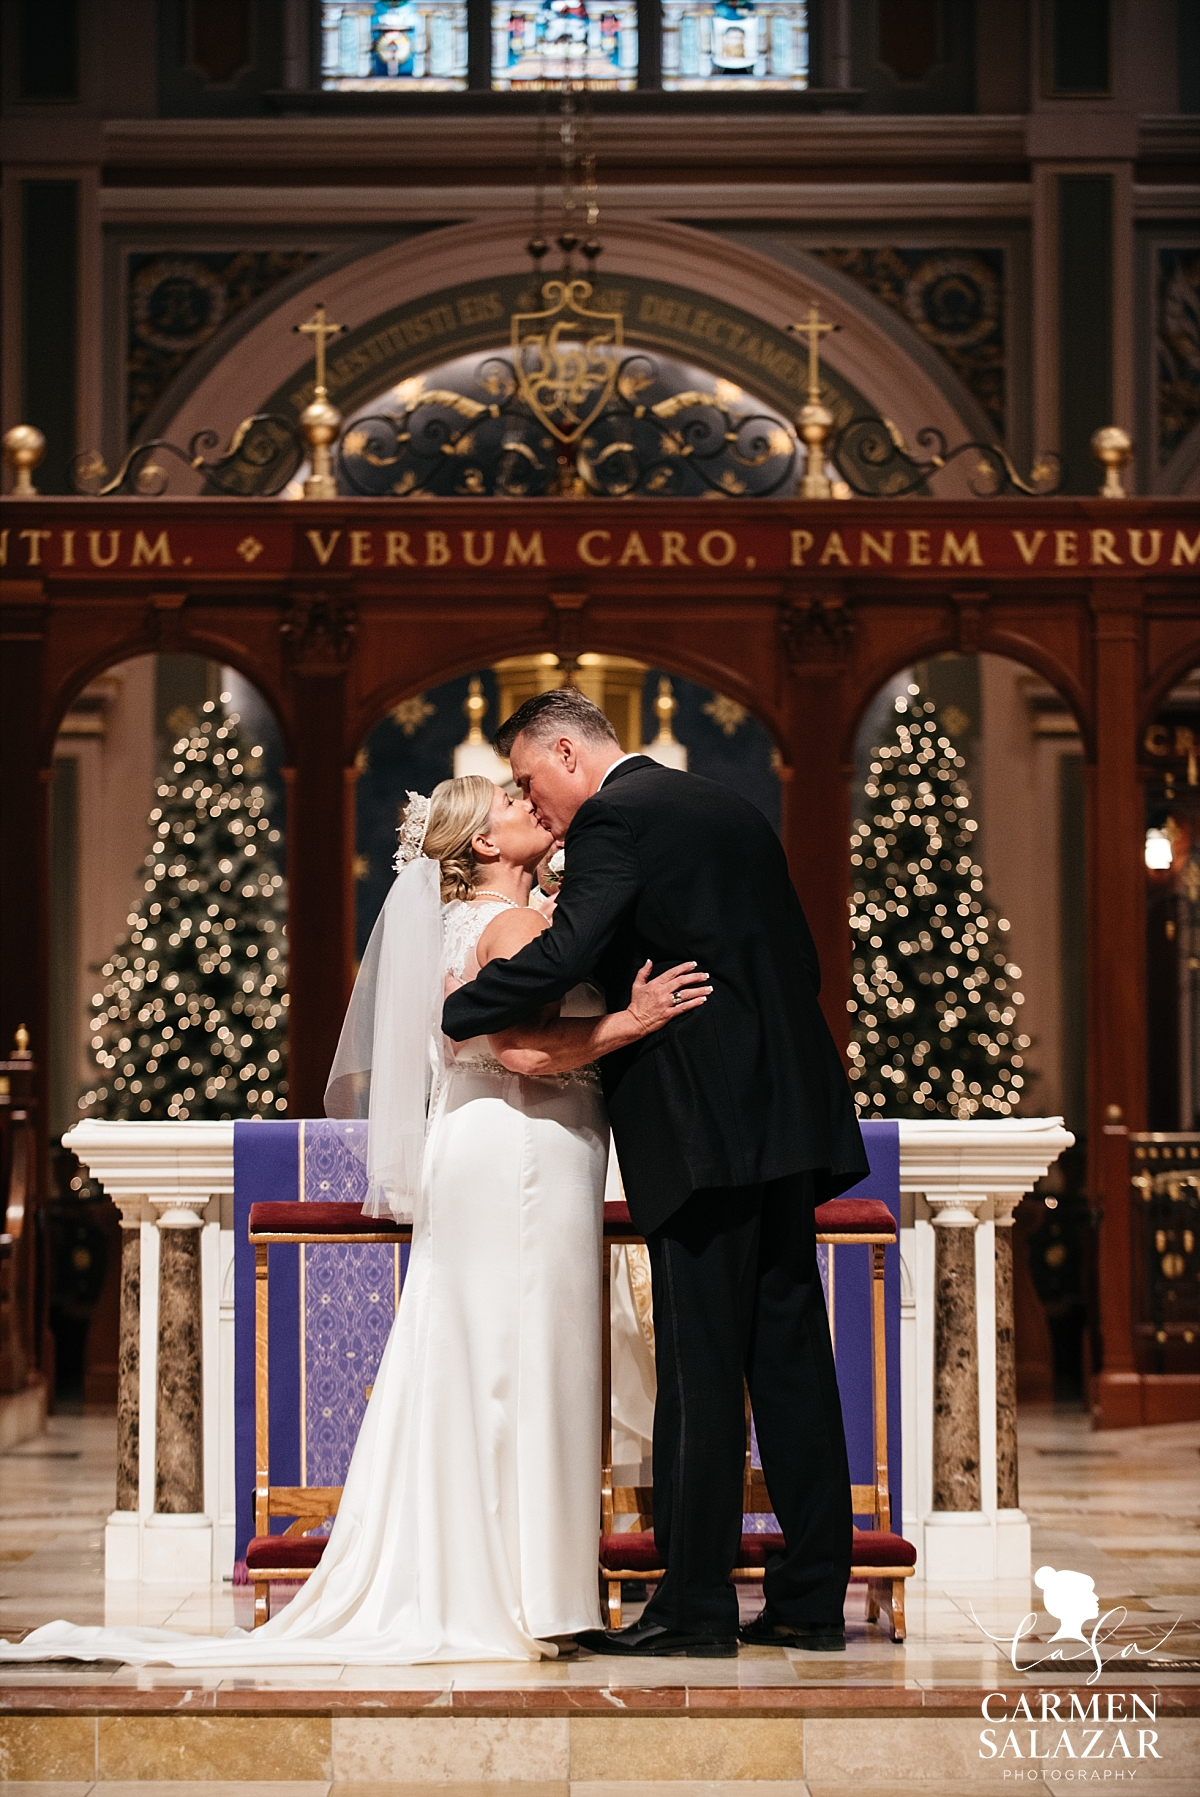 First kiss at Sacramento cathedral wedding - Carmen Salazar